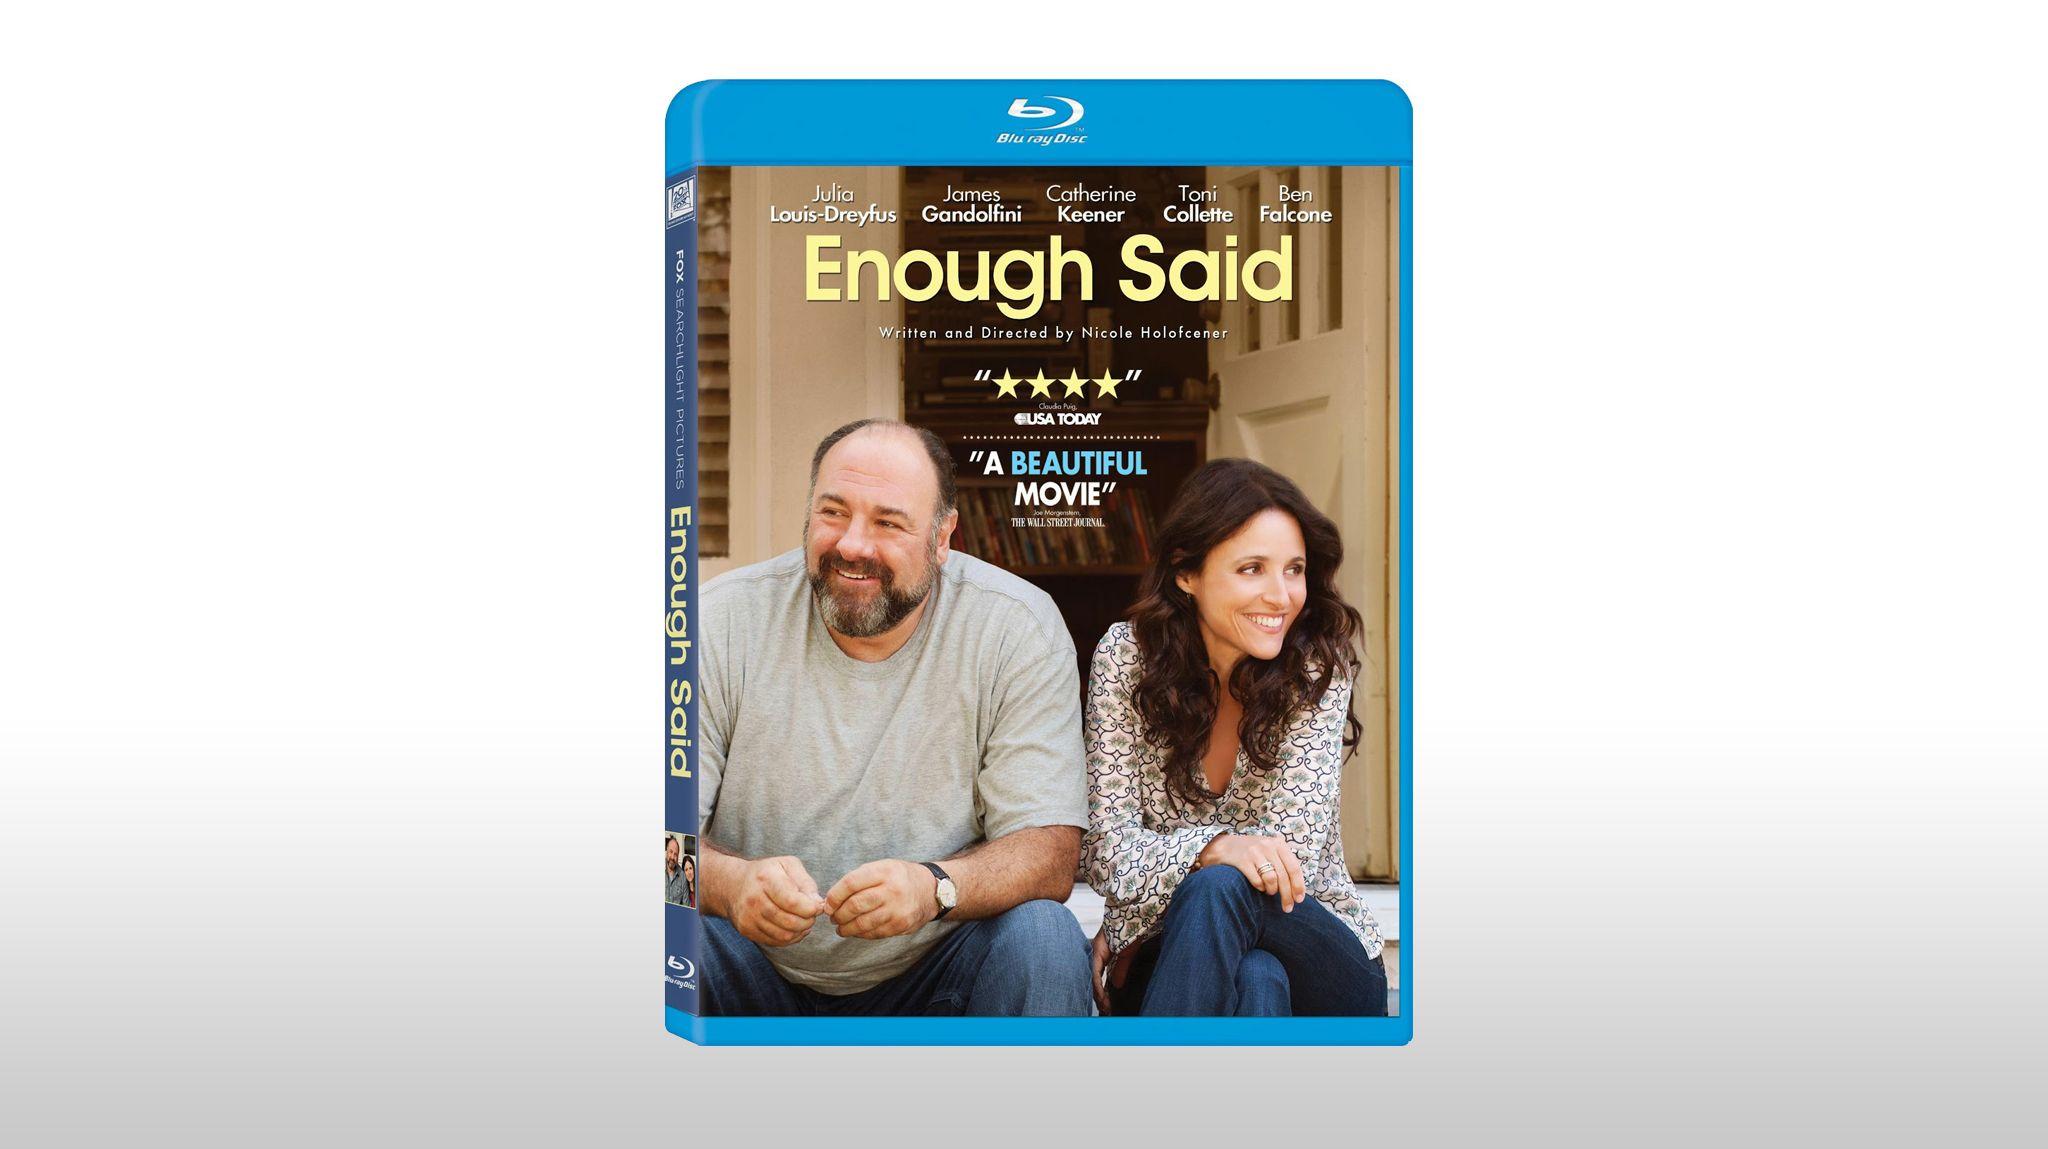 This Week On DVD: Enough Said